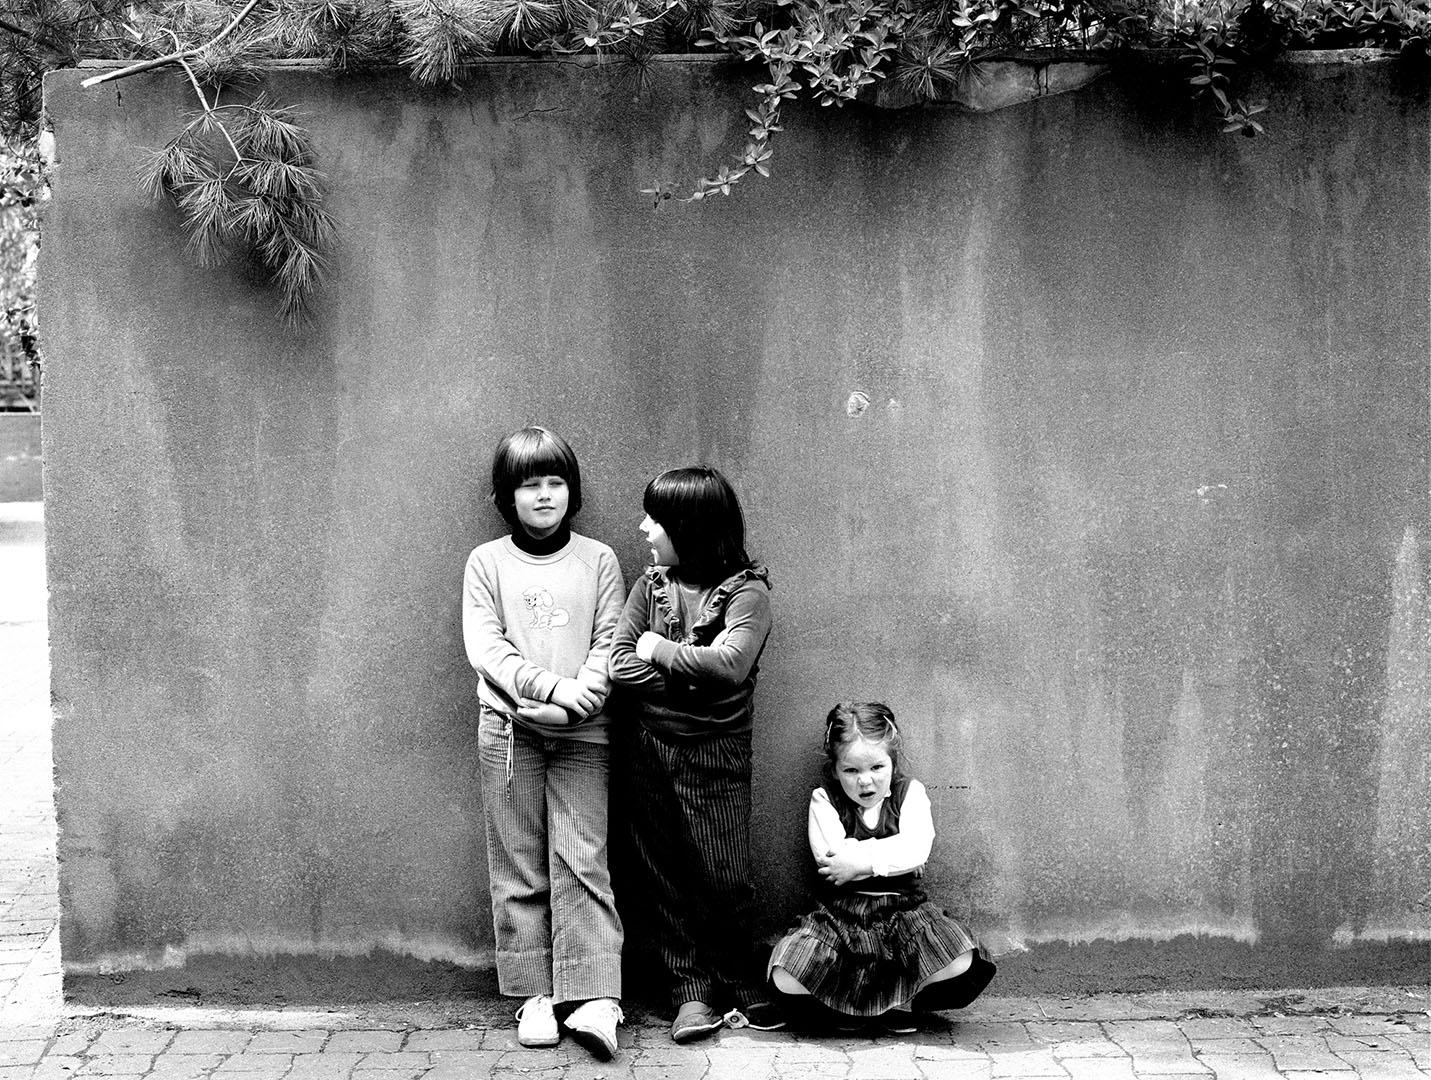 Children_062_P1.34